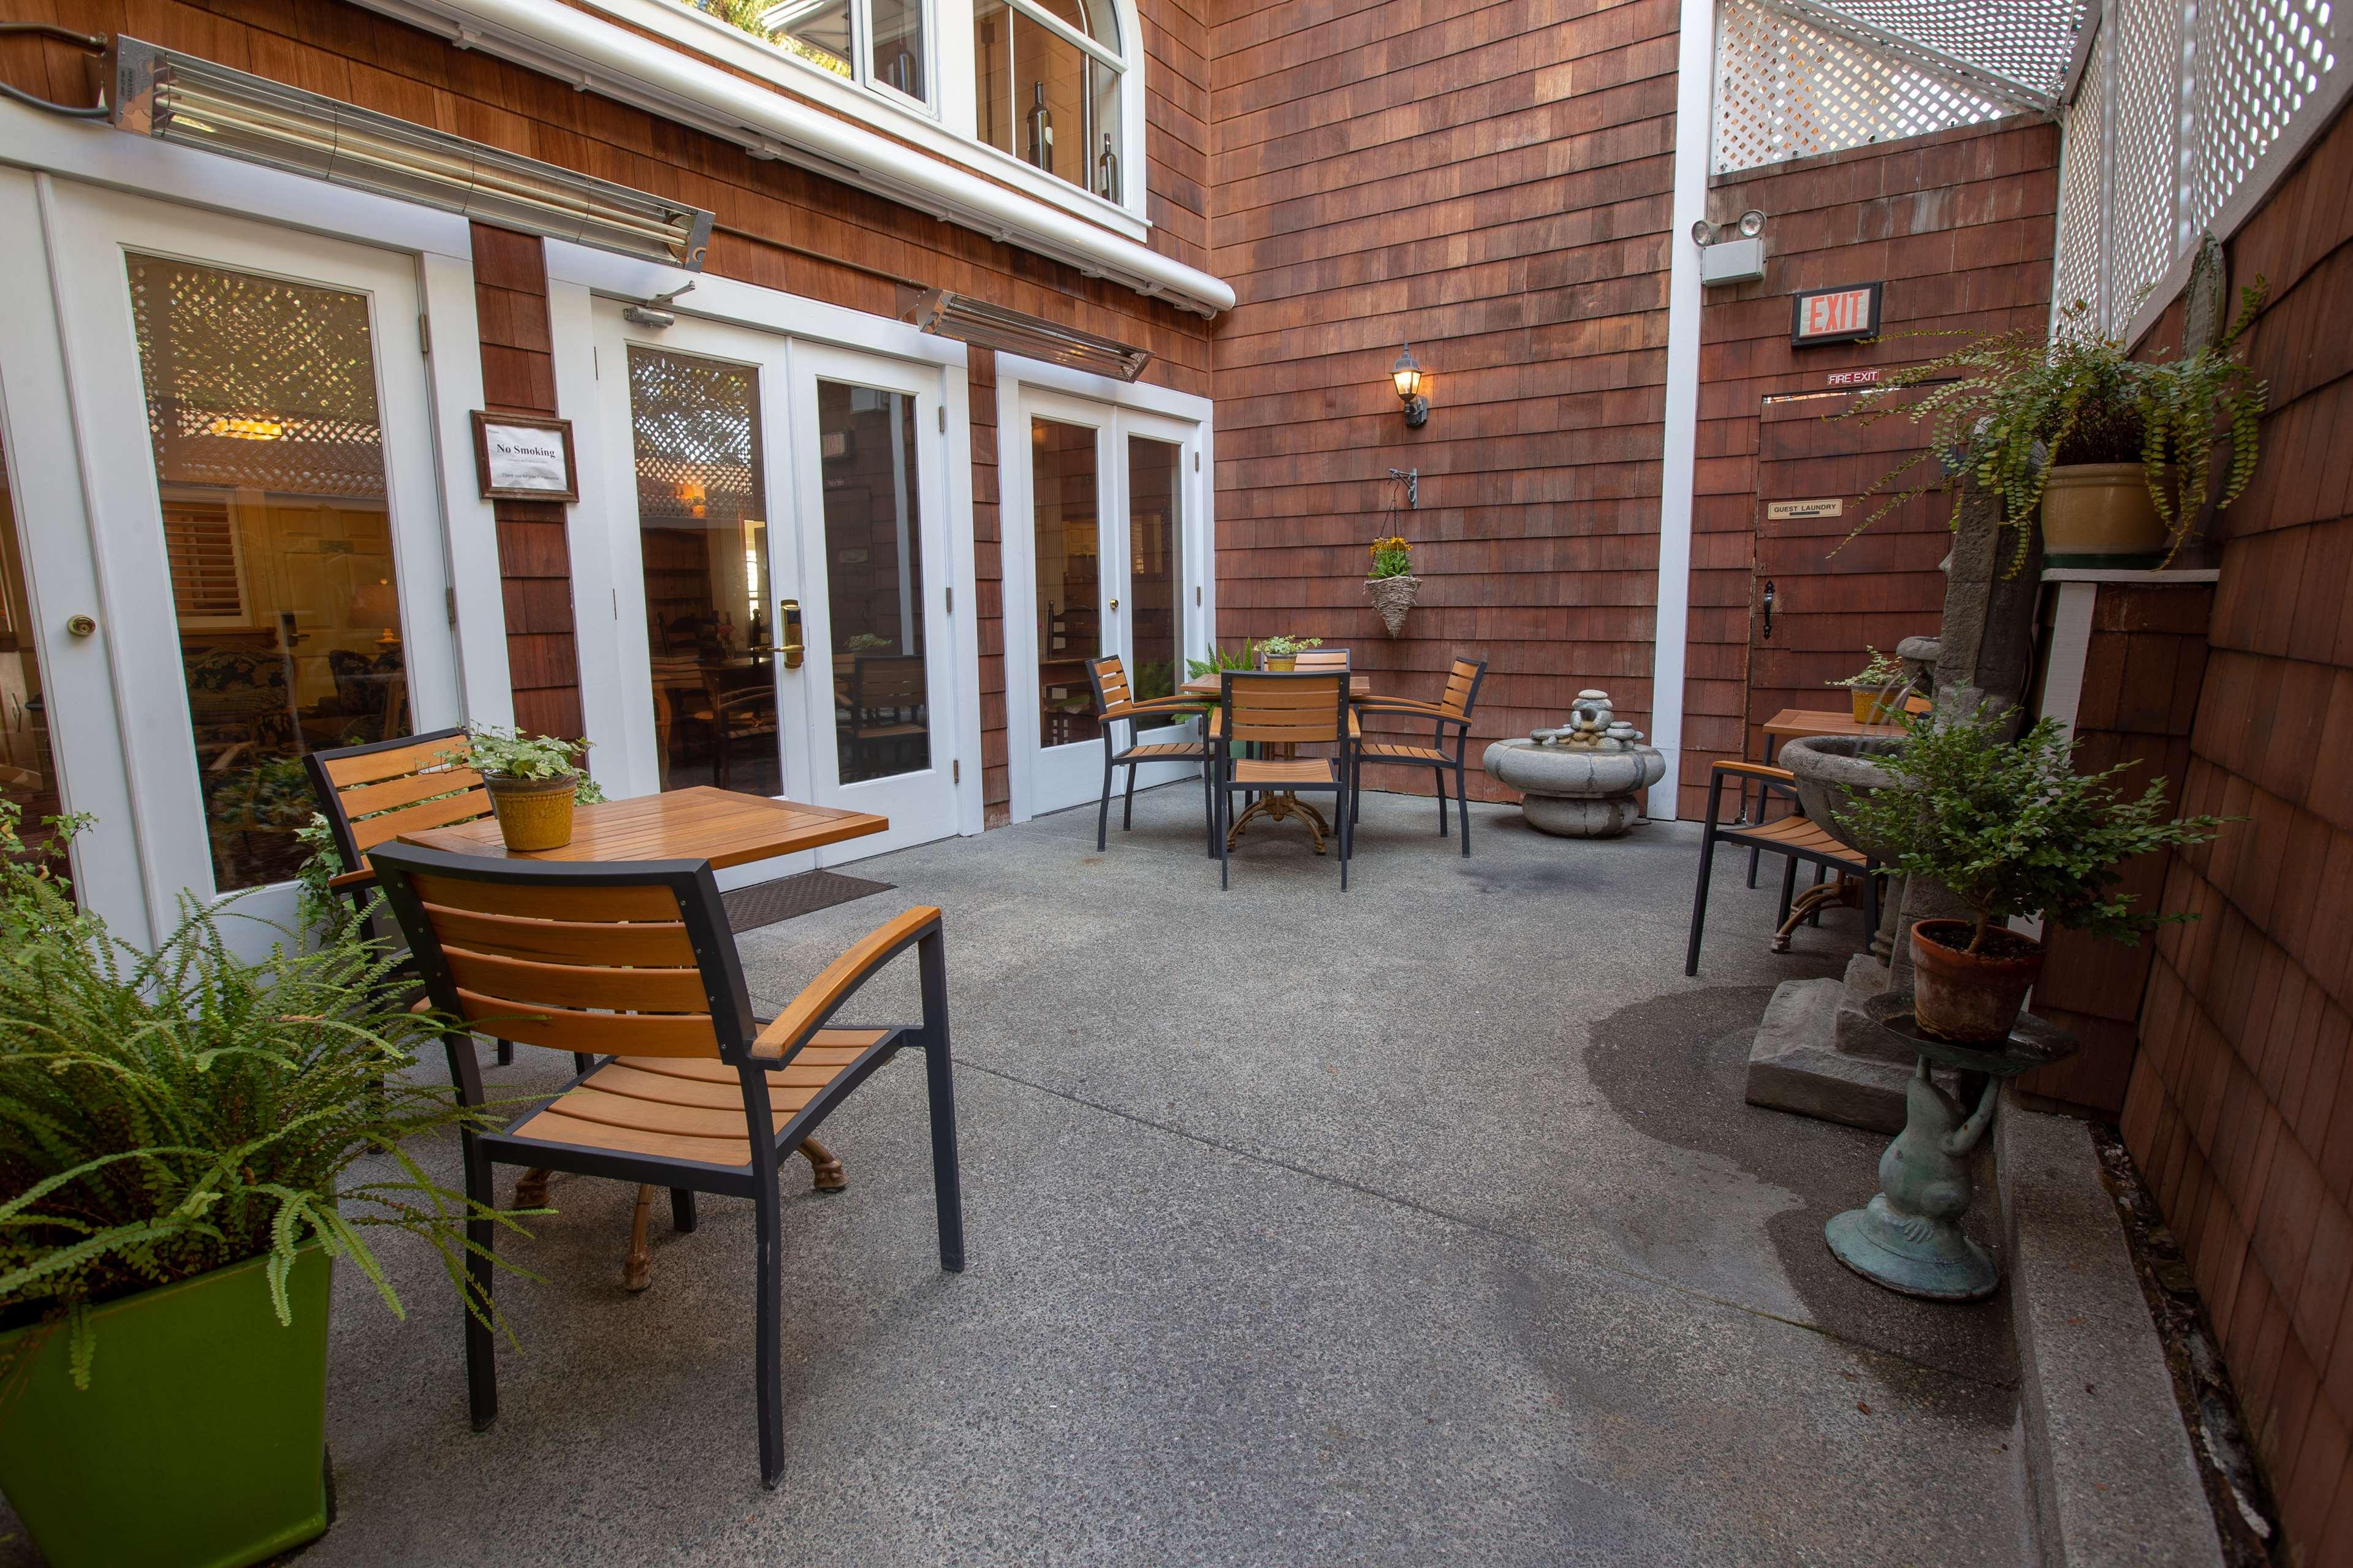 Best Western Plus Elm House Inn image 36